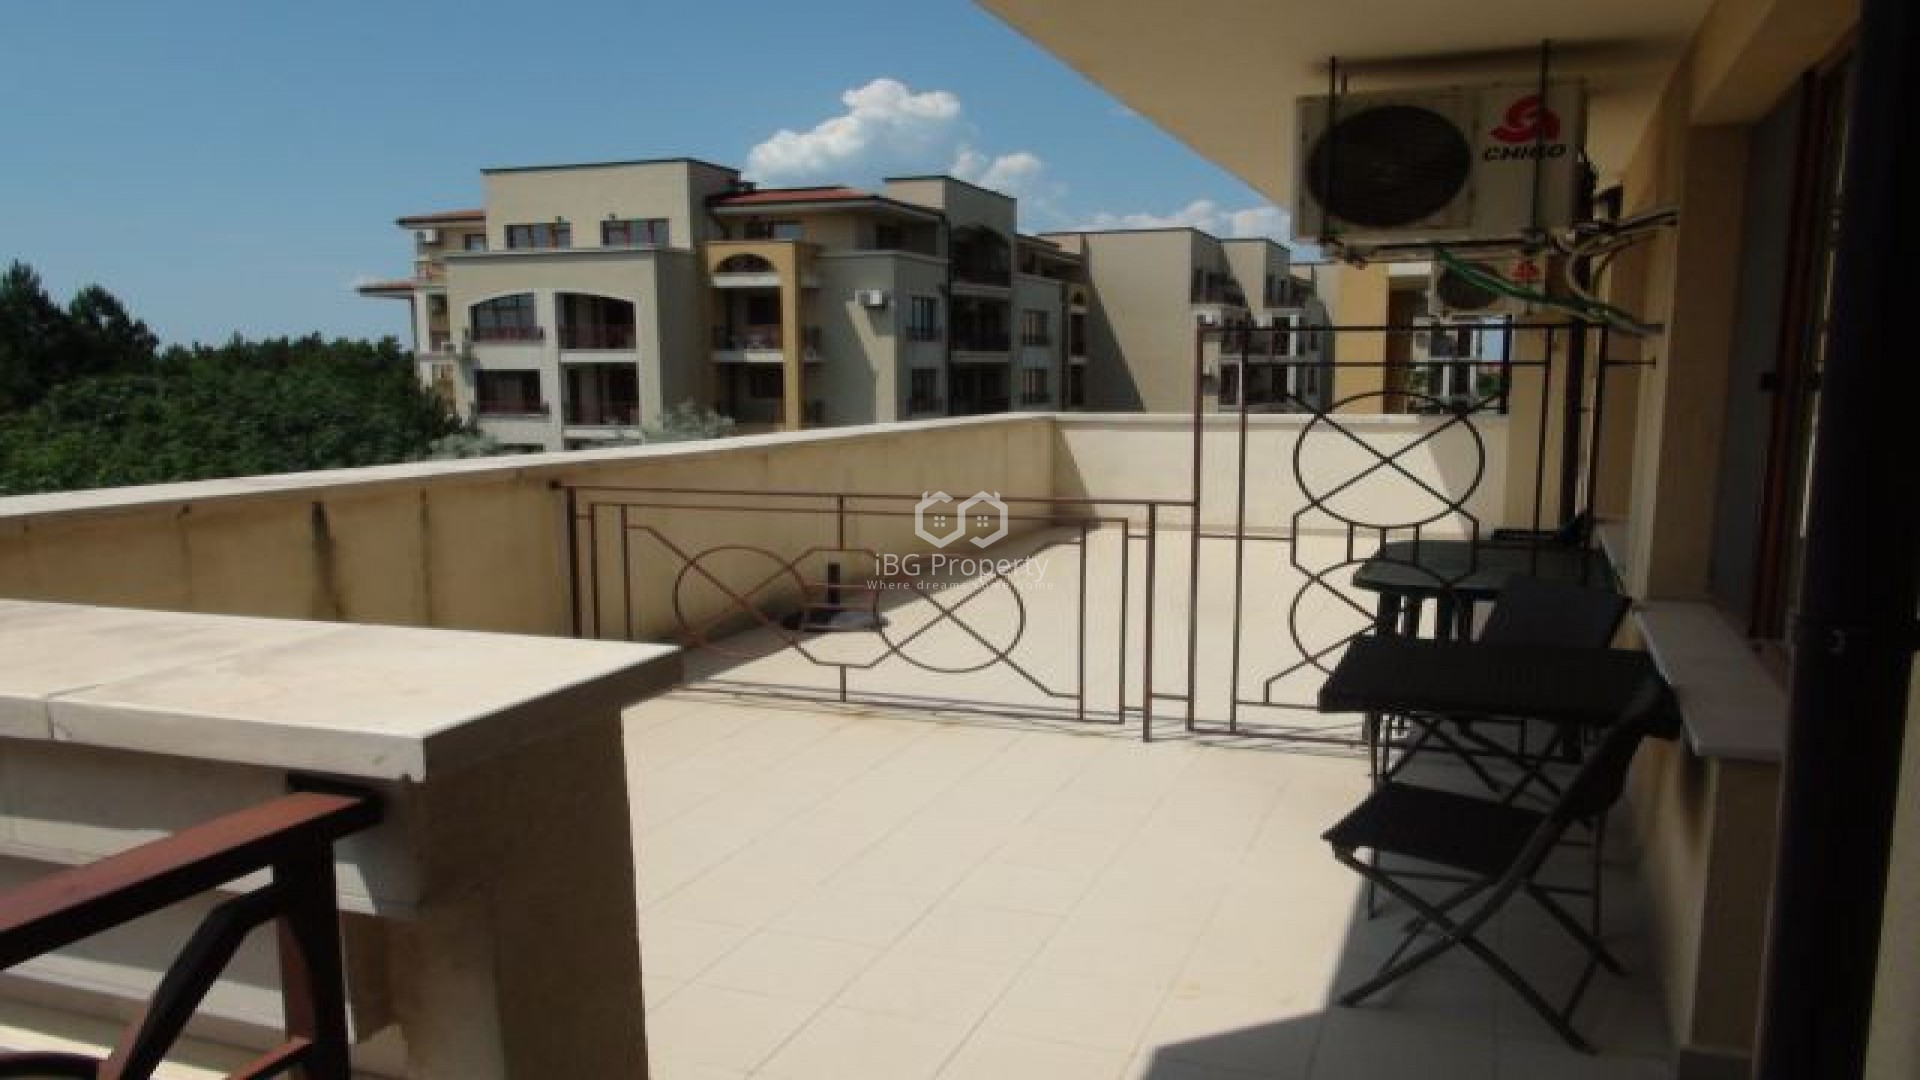 One bedroom apartment Balchik 90 m2